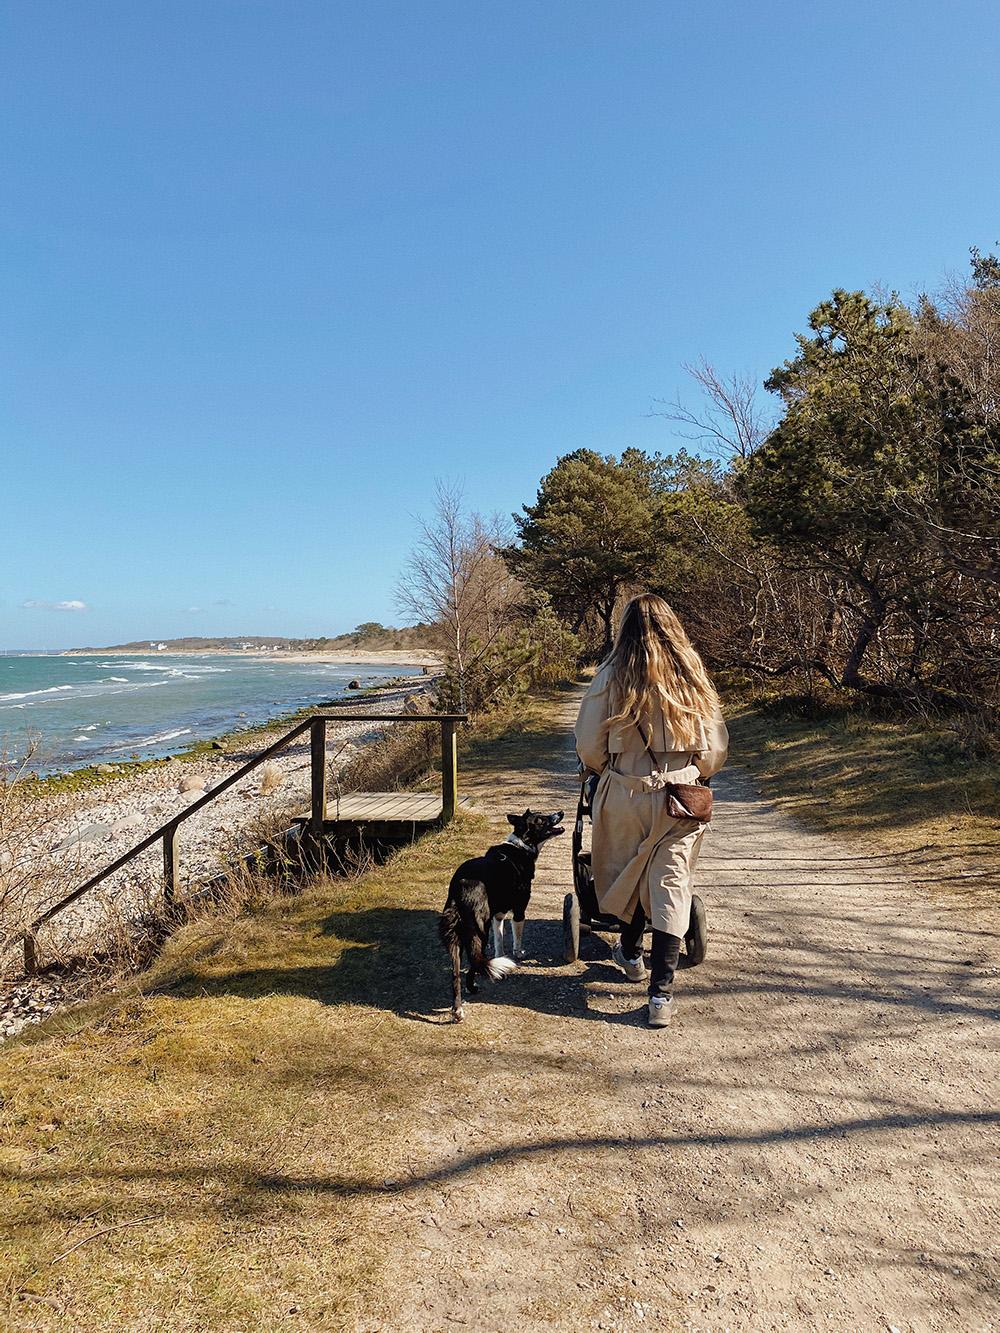 kvinde med barnevogn og hund ved stranden